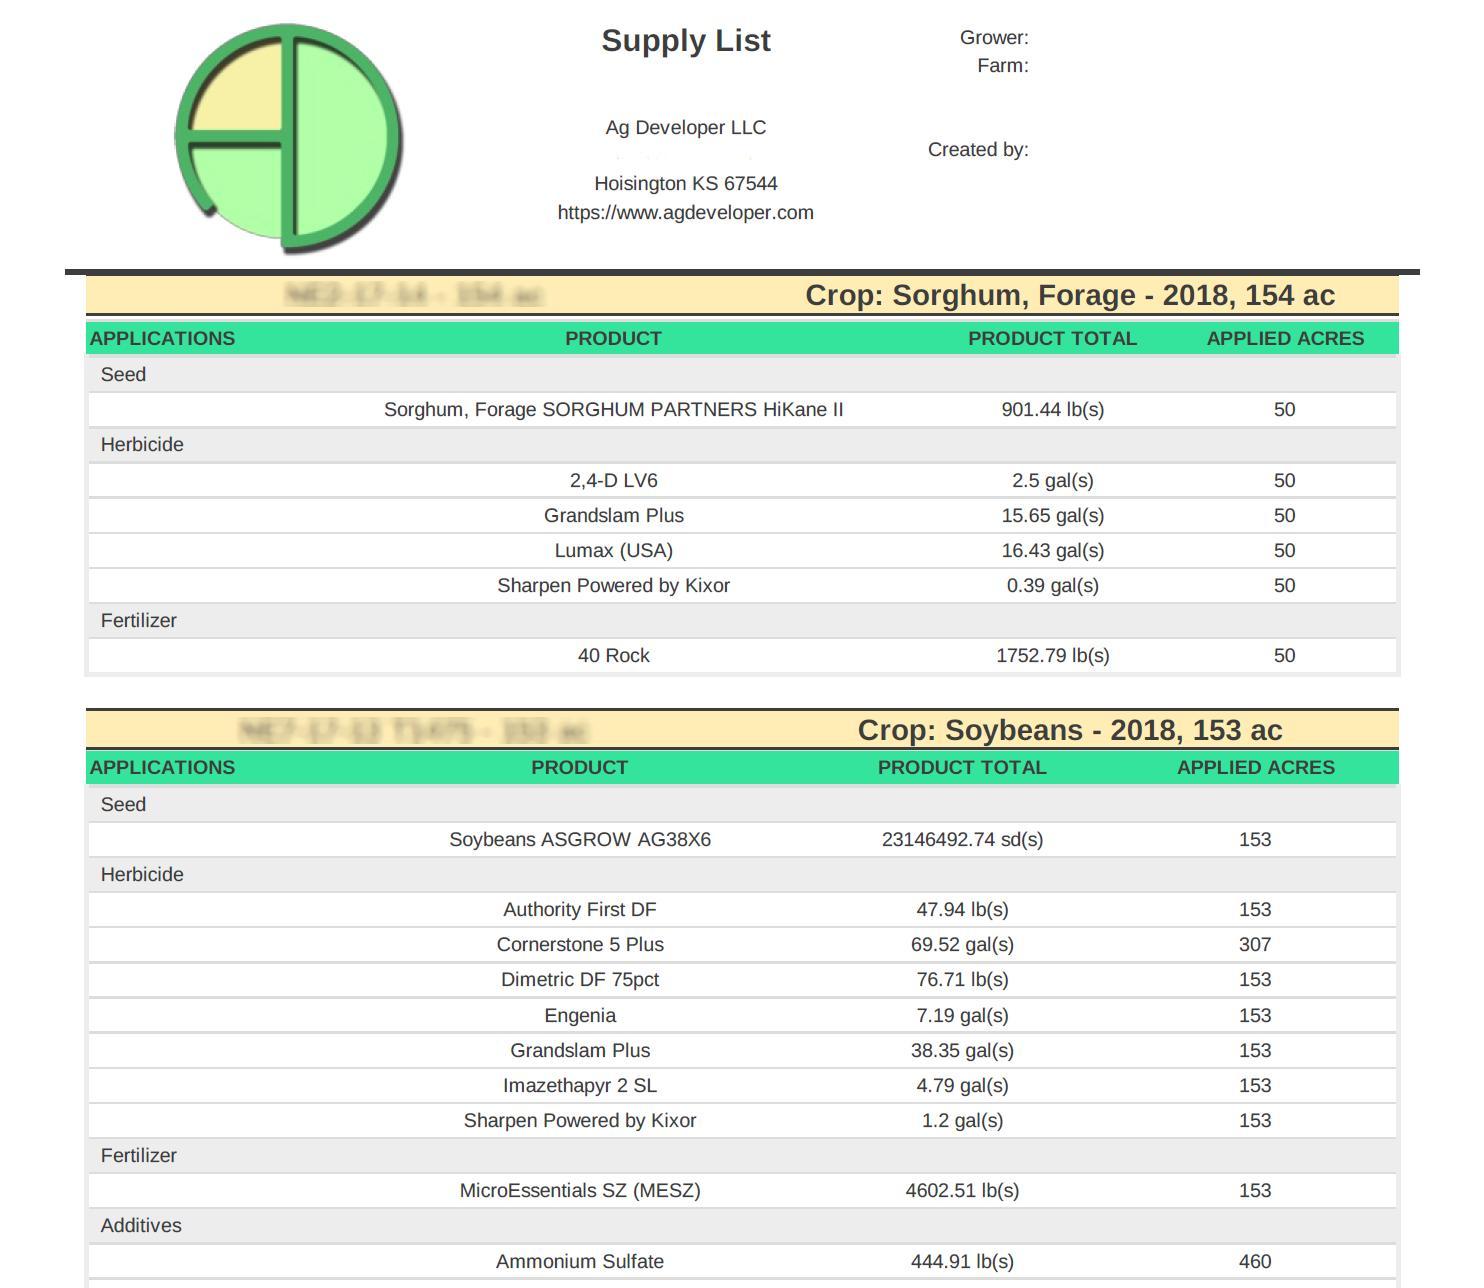 farm supply list report